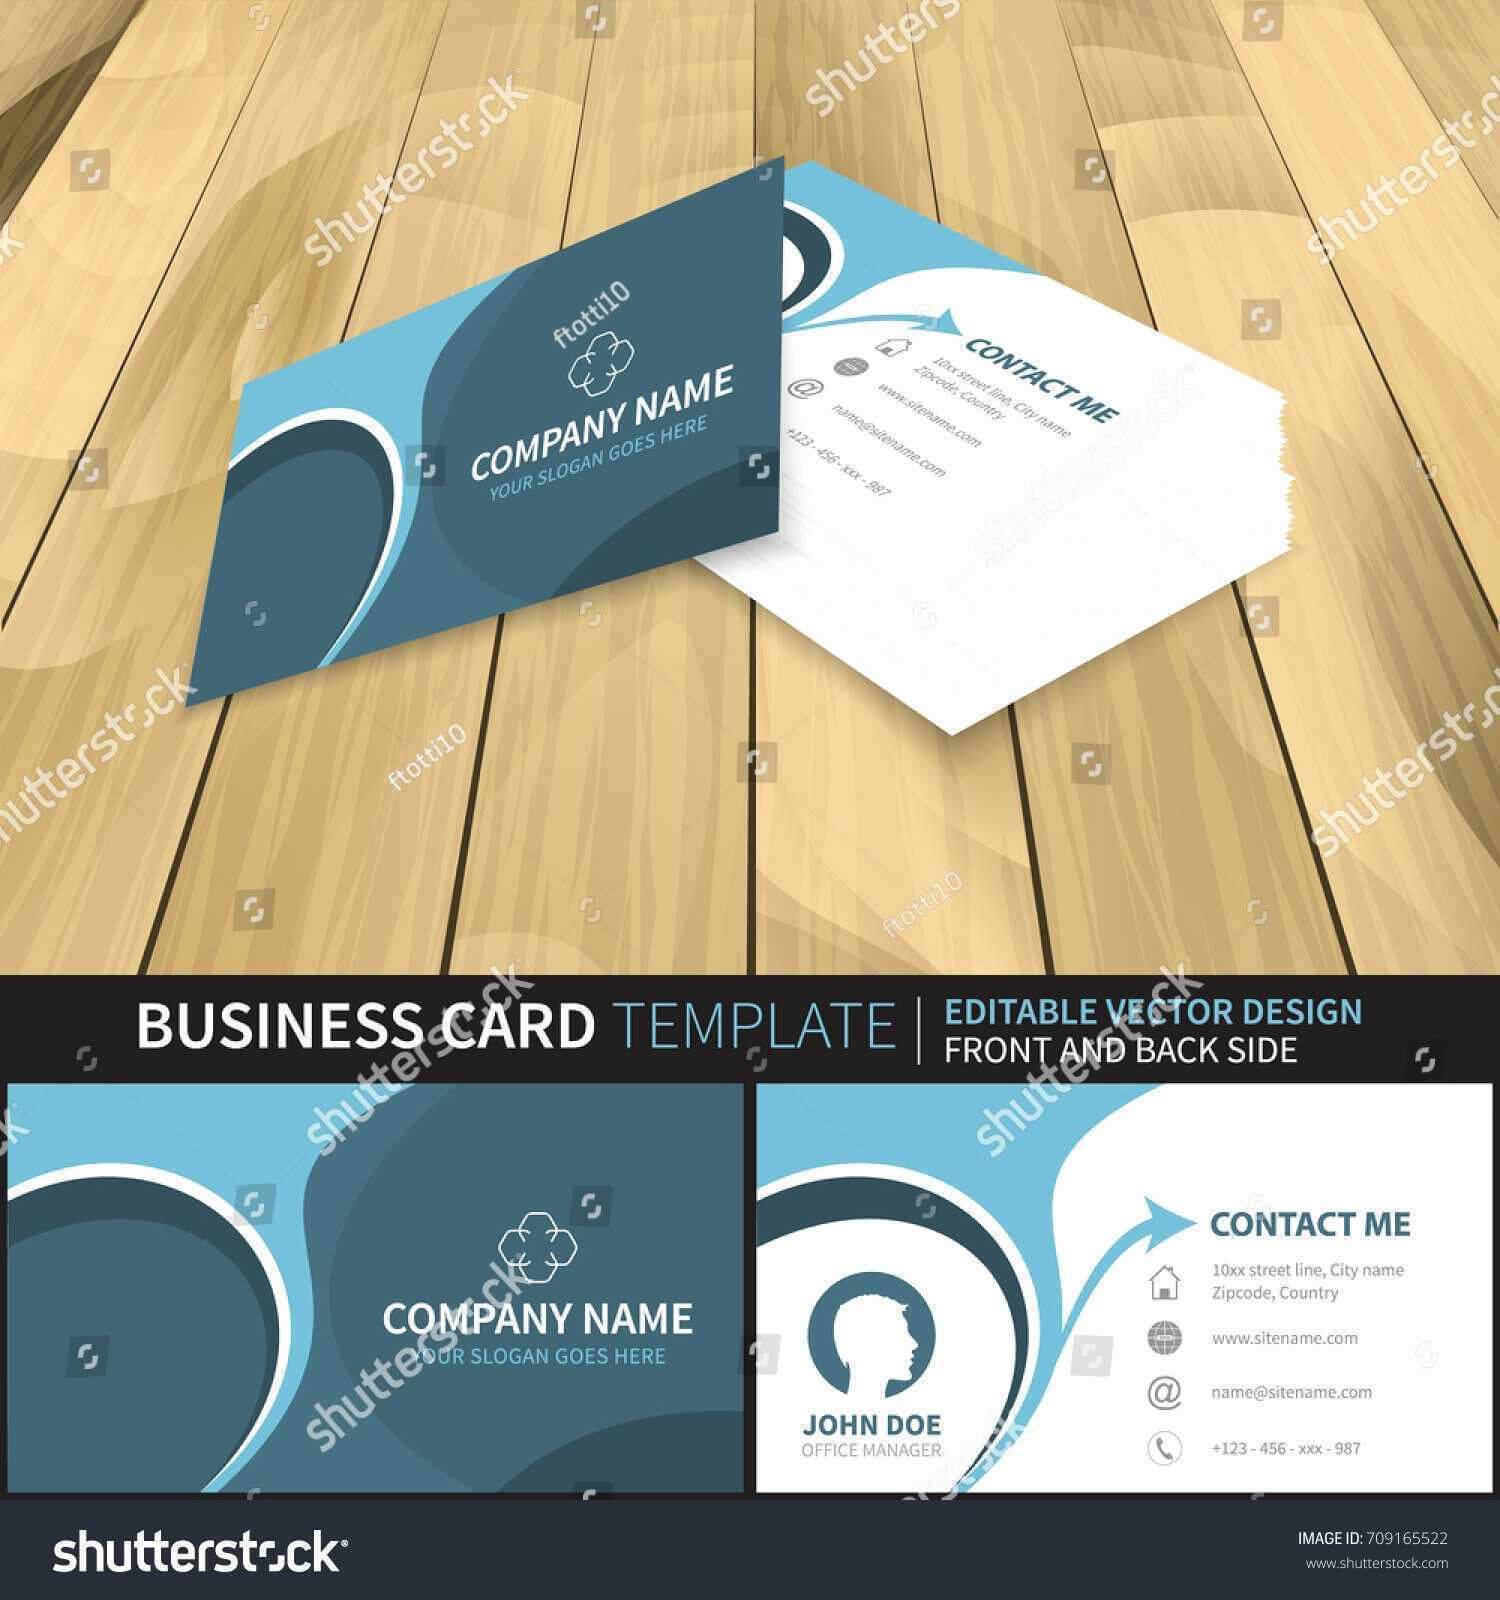 Office Depot Business Card Paper Payment Template Sample Kit With Office Depot Business Card Template